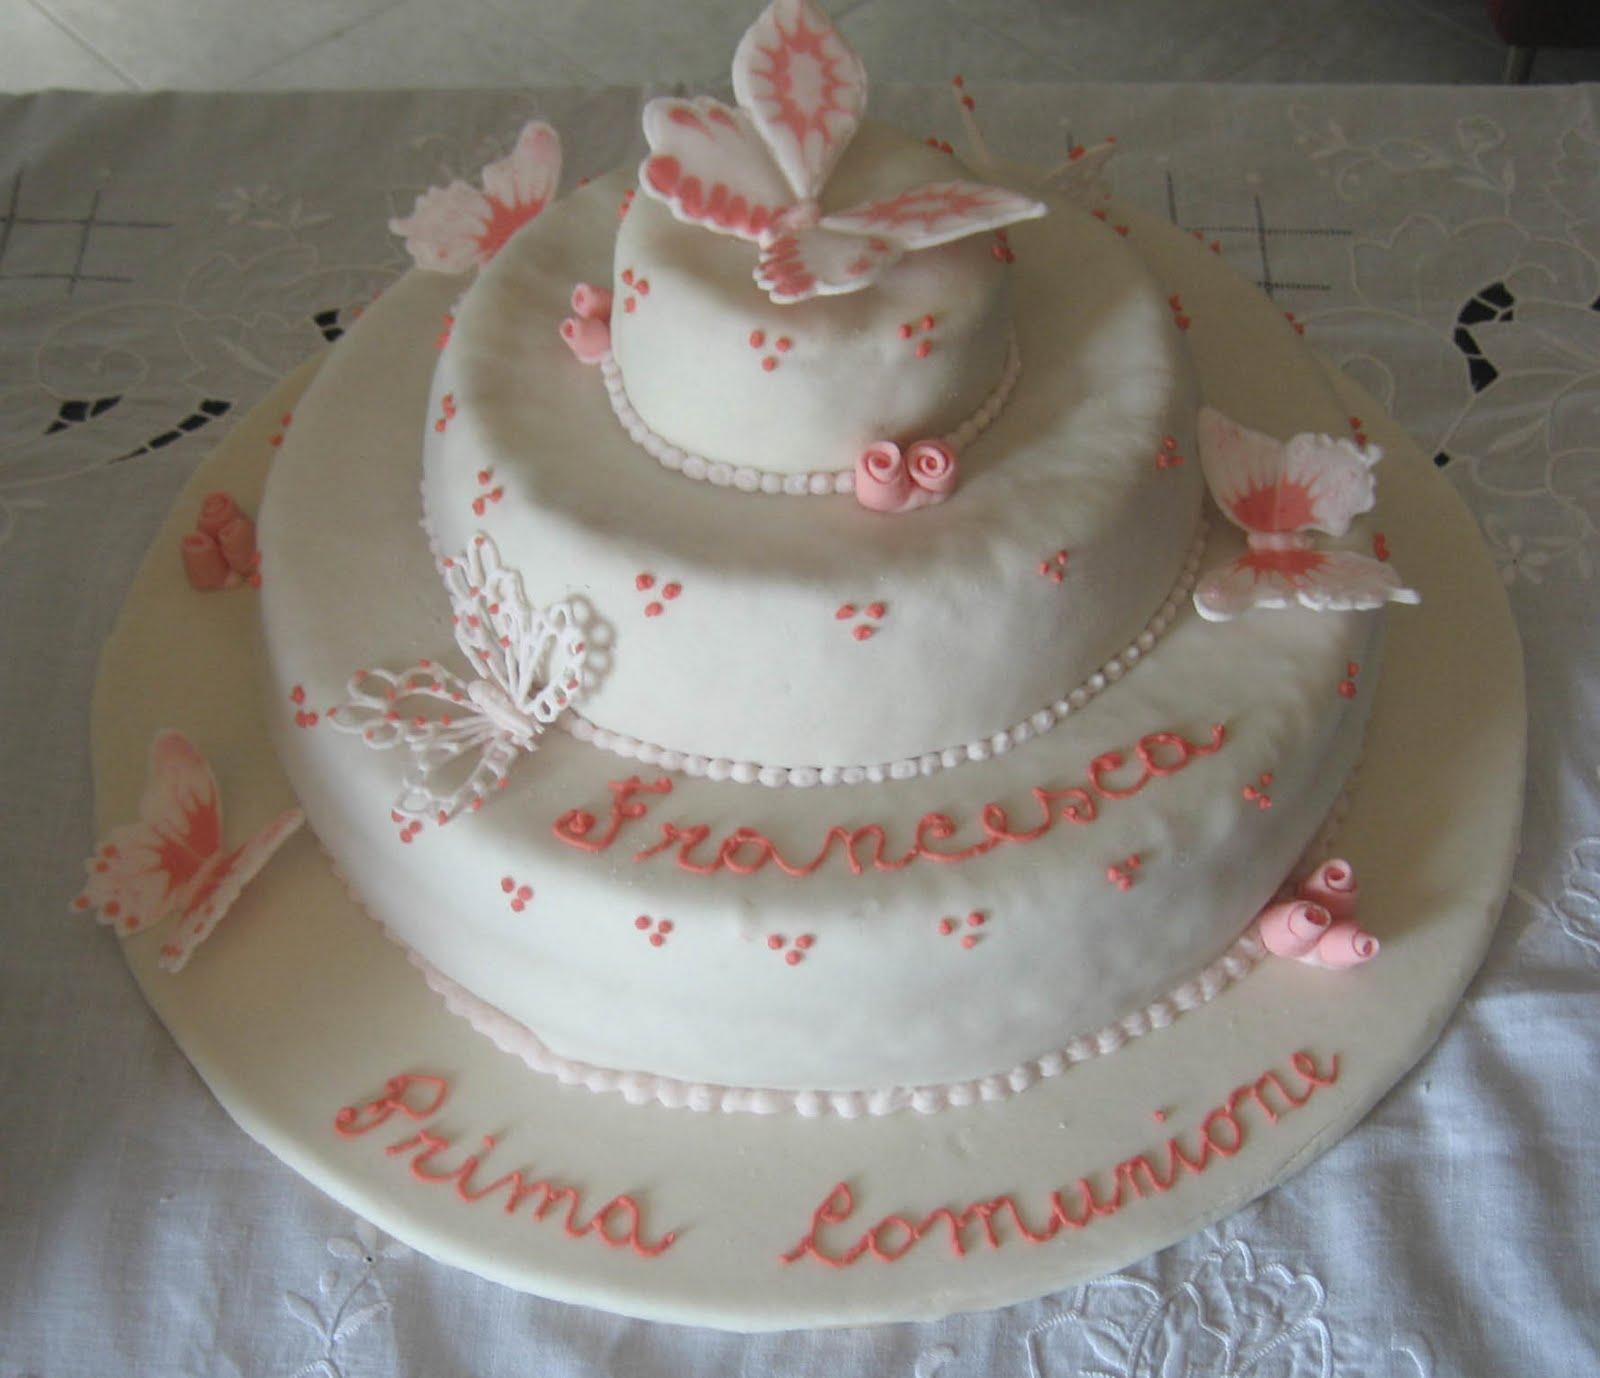 Eccezionale torta+francesca.jpg TO55